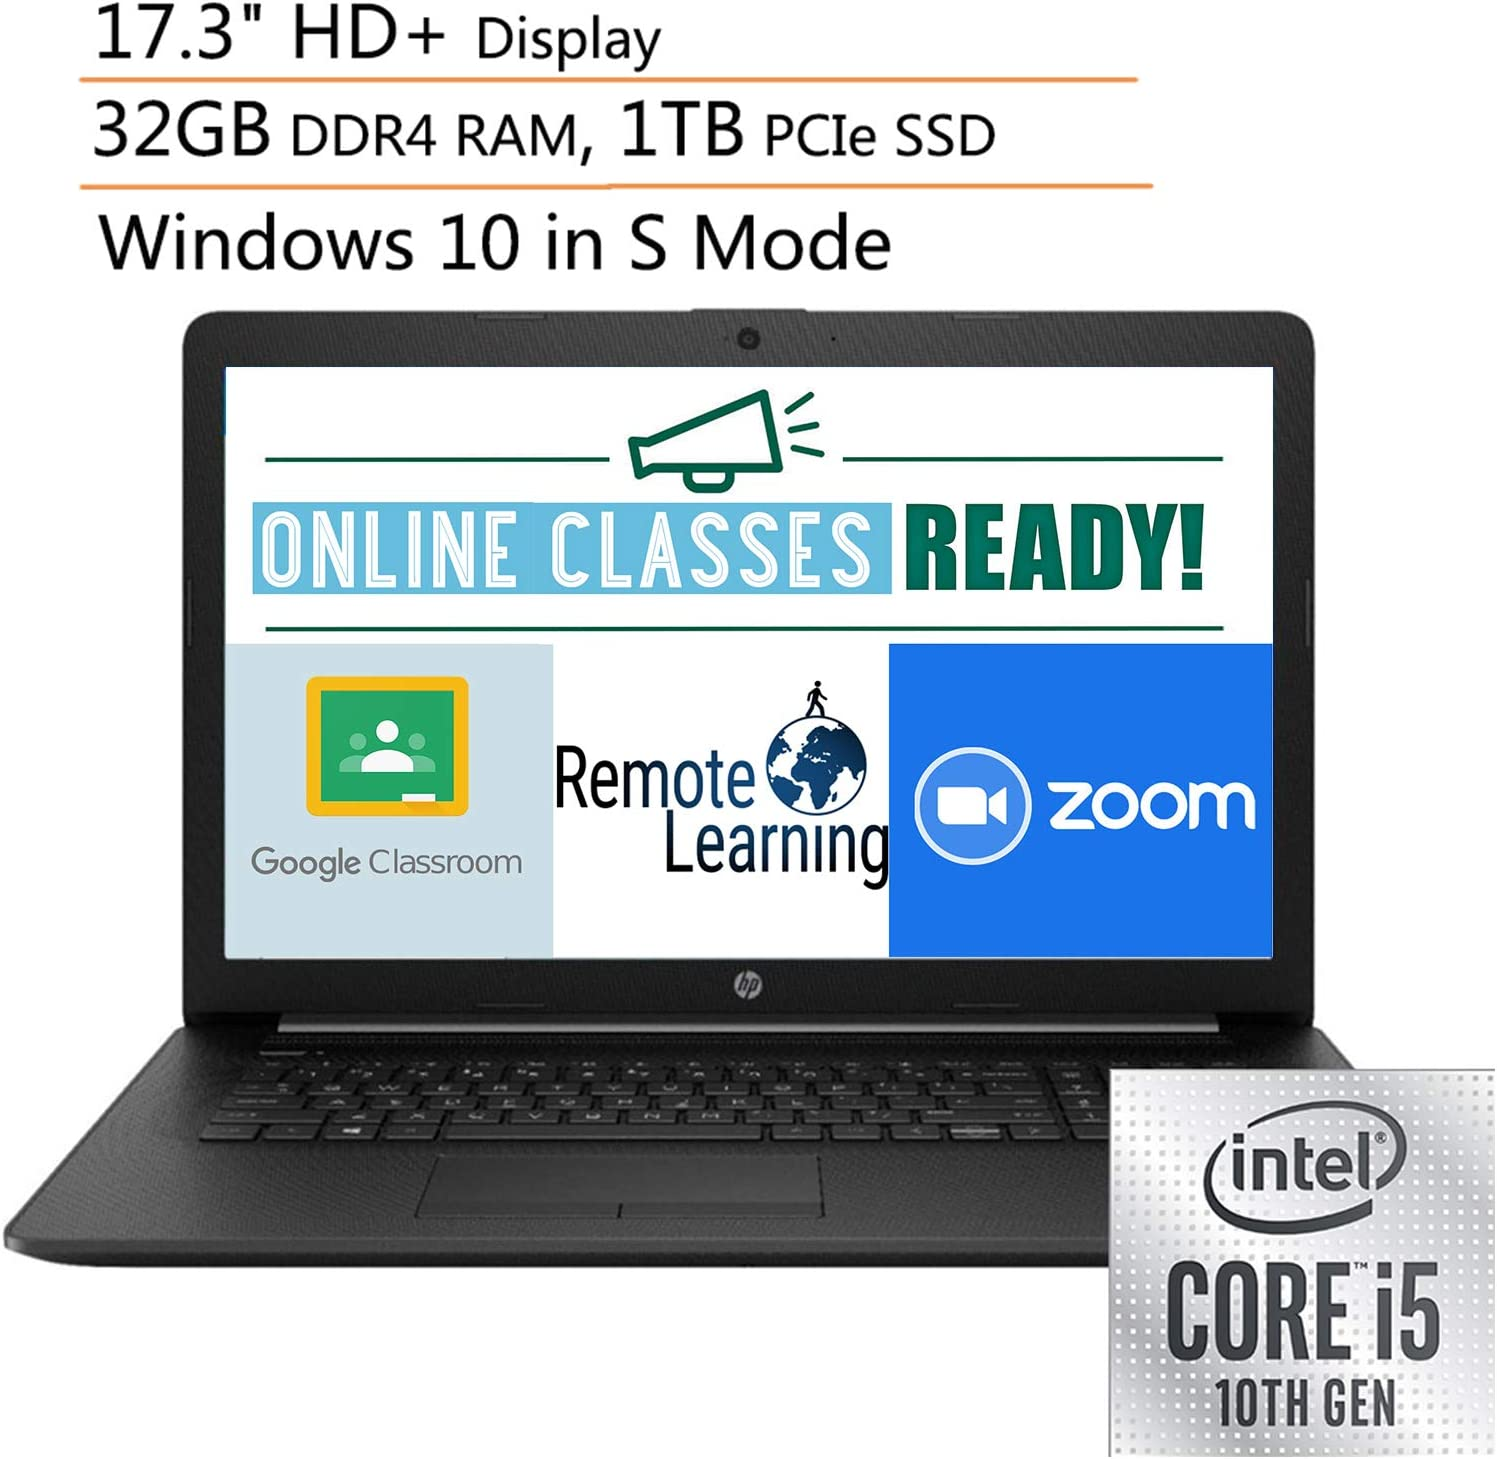 "2020 HP 17 17.3"" HD+ Laptop Computer, 10th Gen Intel Quad-Core i5 1035G1 Up to 3.4GHz (Beats i7-7500u), 32GB DDR4 RAM, 1TB PCIe SSD, DVDRW, Webcam, Windows 10, Ipuzzle Mouse Pad, Online Class Ready"